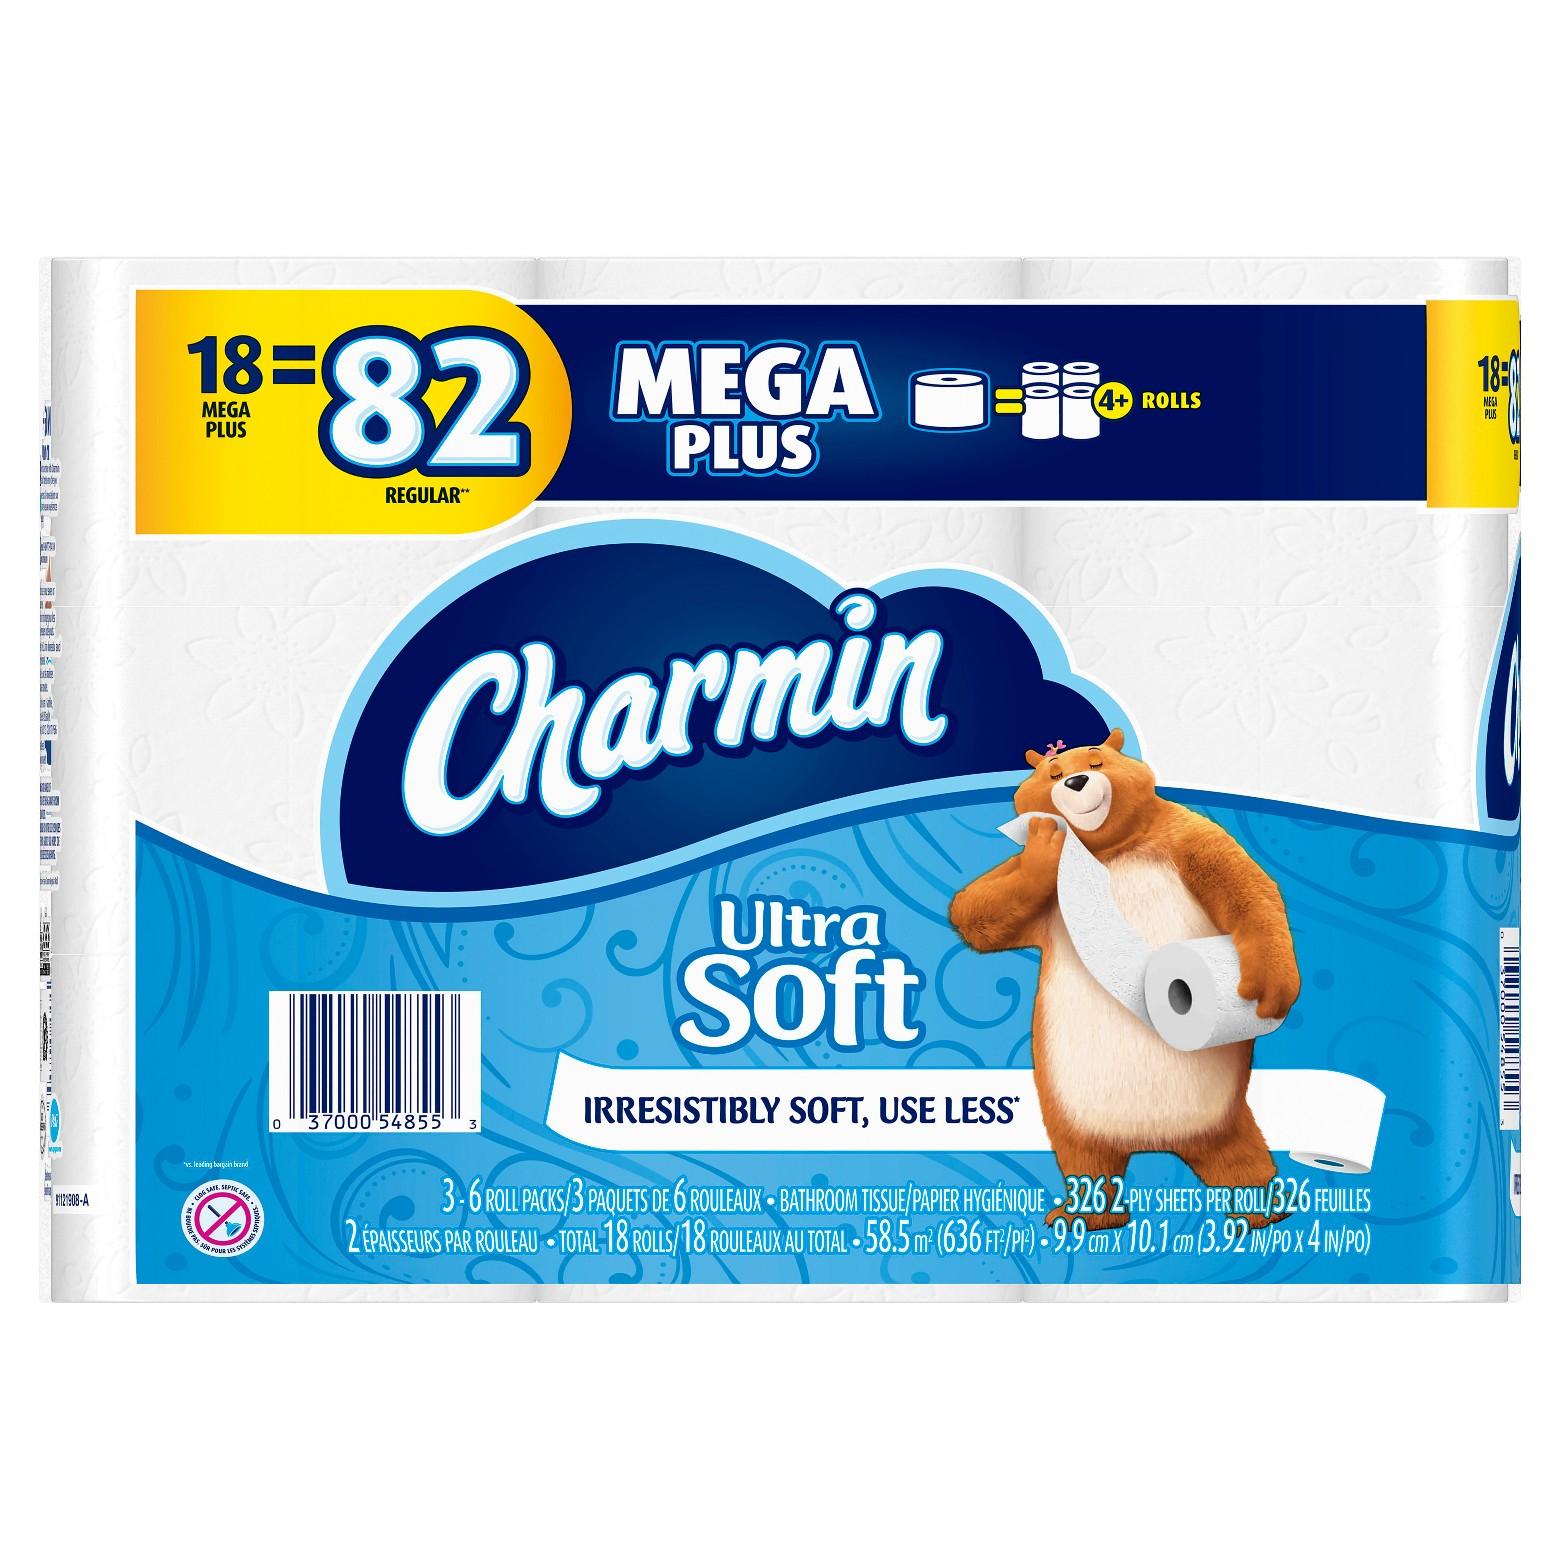 36 ct Charmin Ultra Soft Mega Plus Rolls + $5 giftcard  + FS $36.98